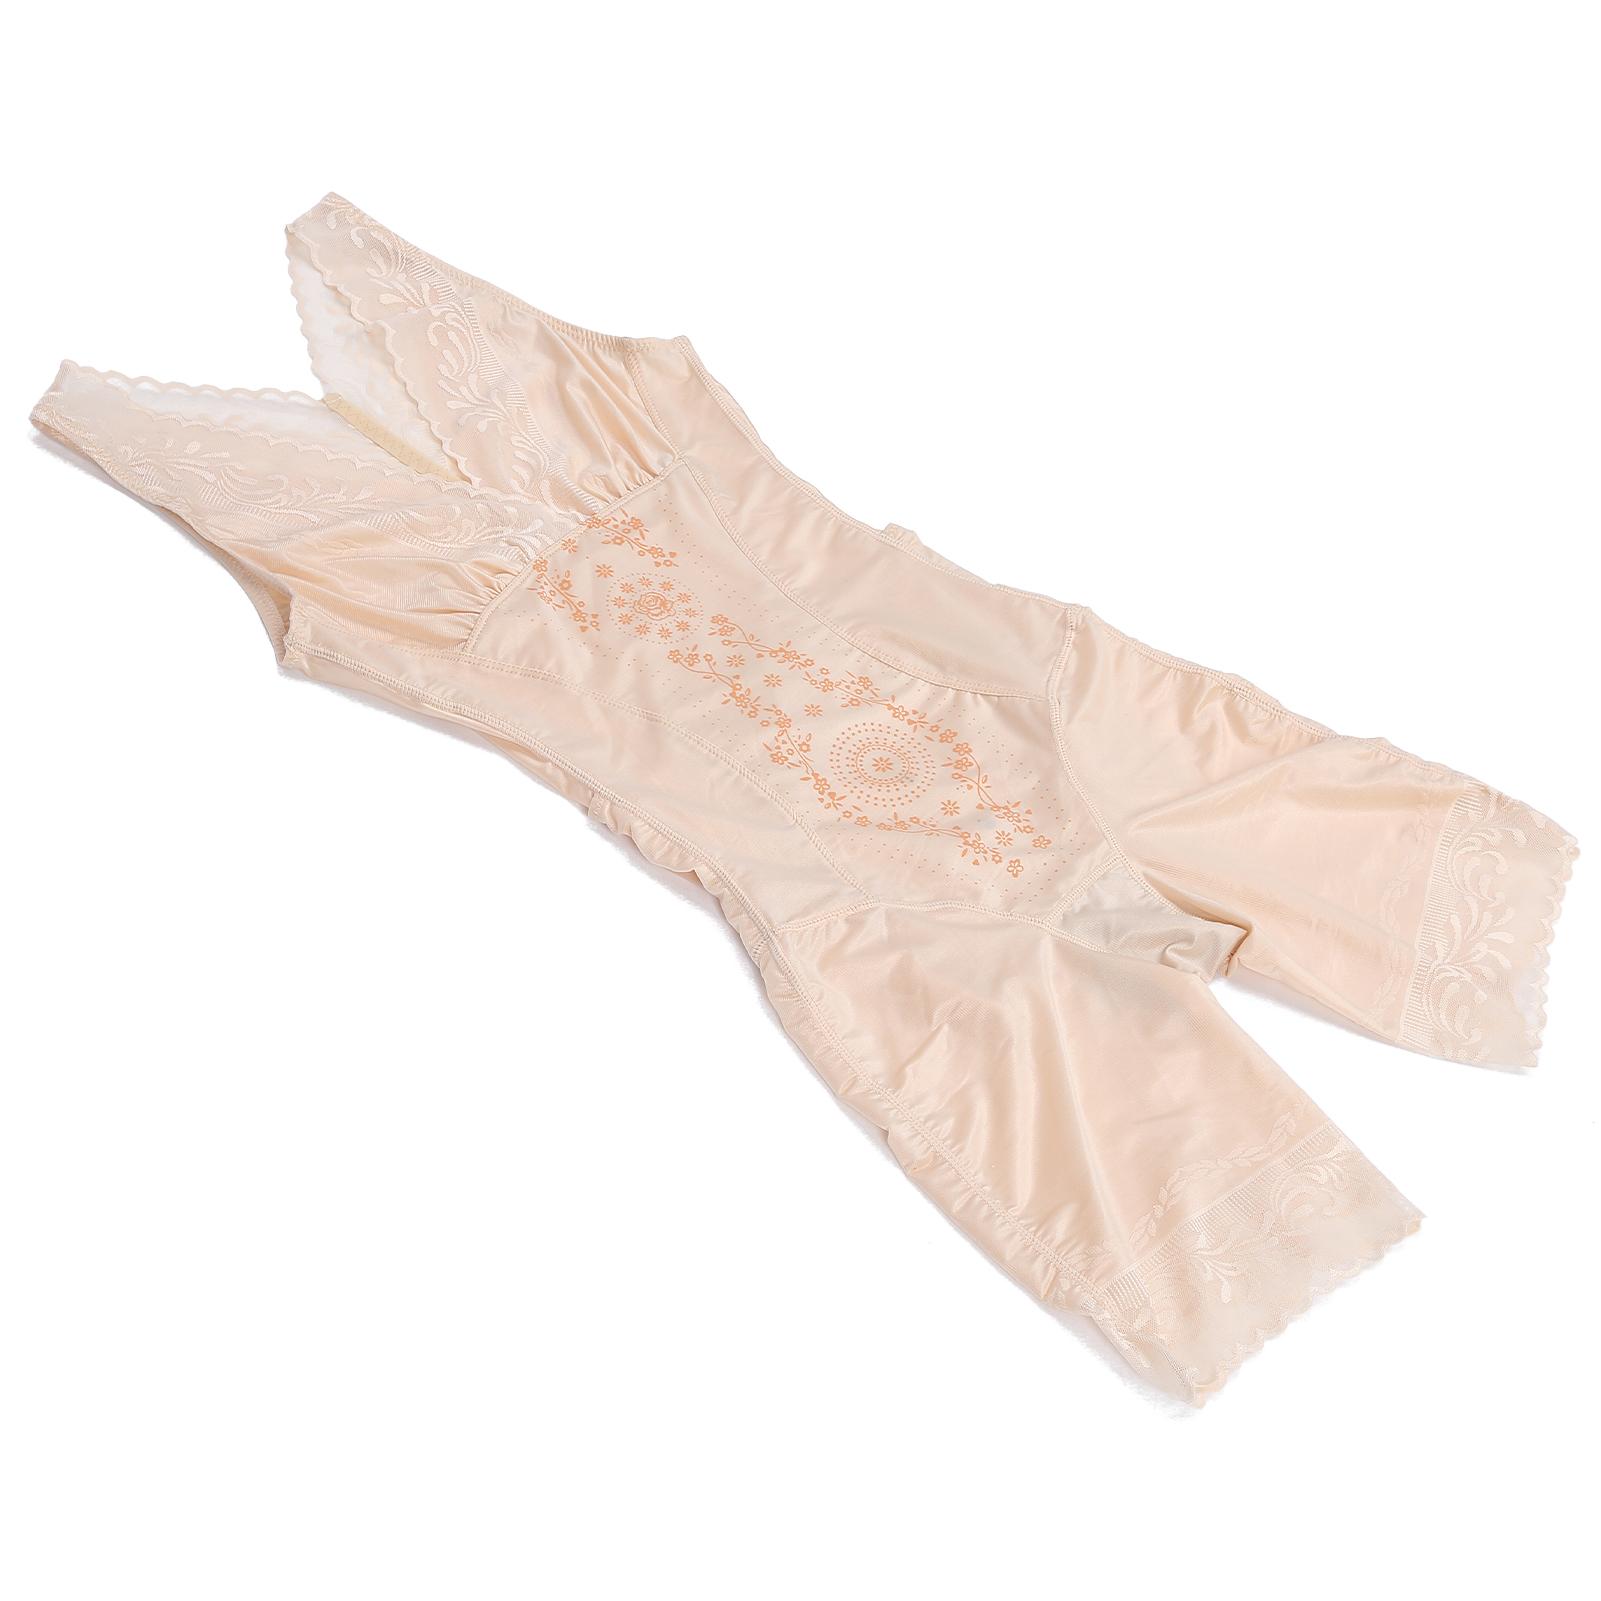 miniature 17 - Women's Full Body Taille Trainer Shaper Taille Corset underbust corset shapewear